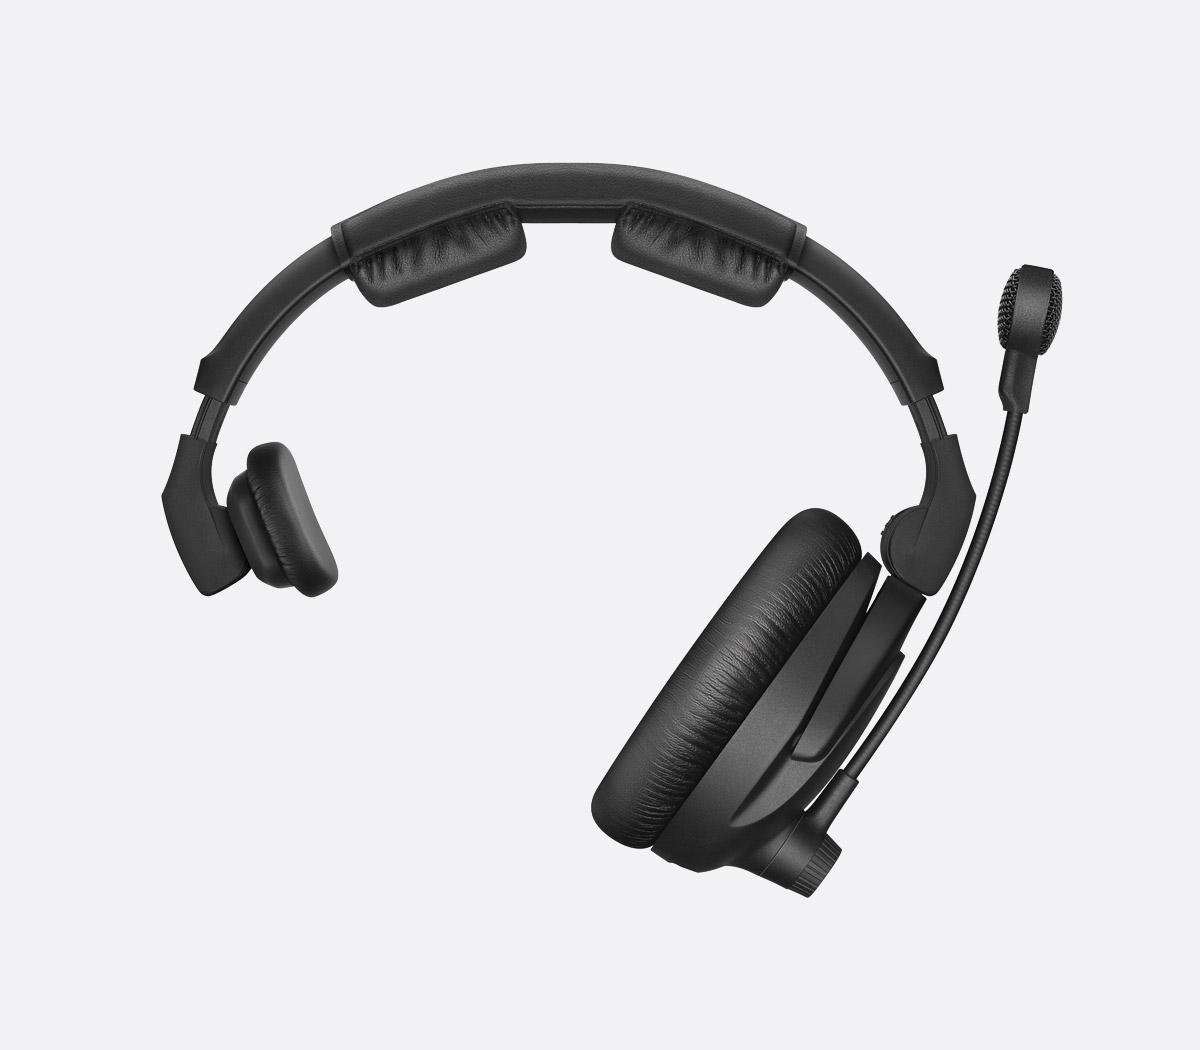 aeb1f2fb400 SENNHEISER HMD 301 PRO HEADSET Single ear 64 ohms, 300 ohm dynamic mic,  without cable